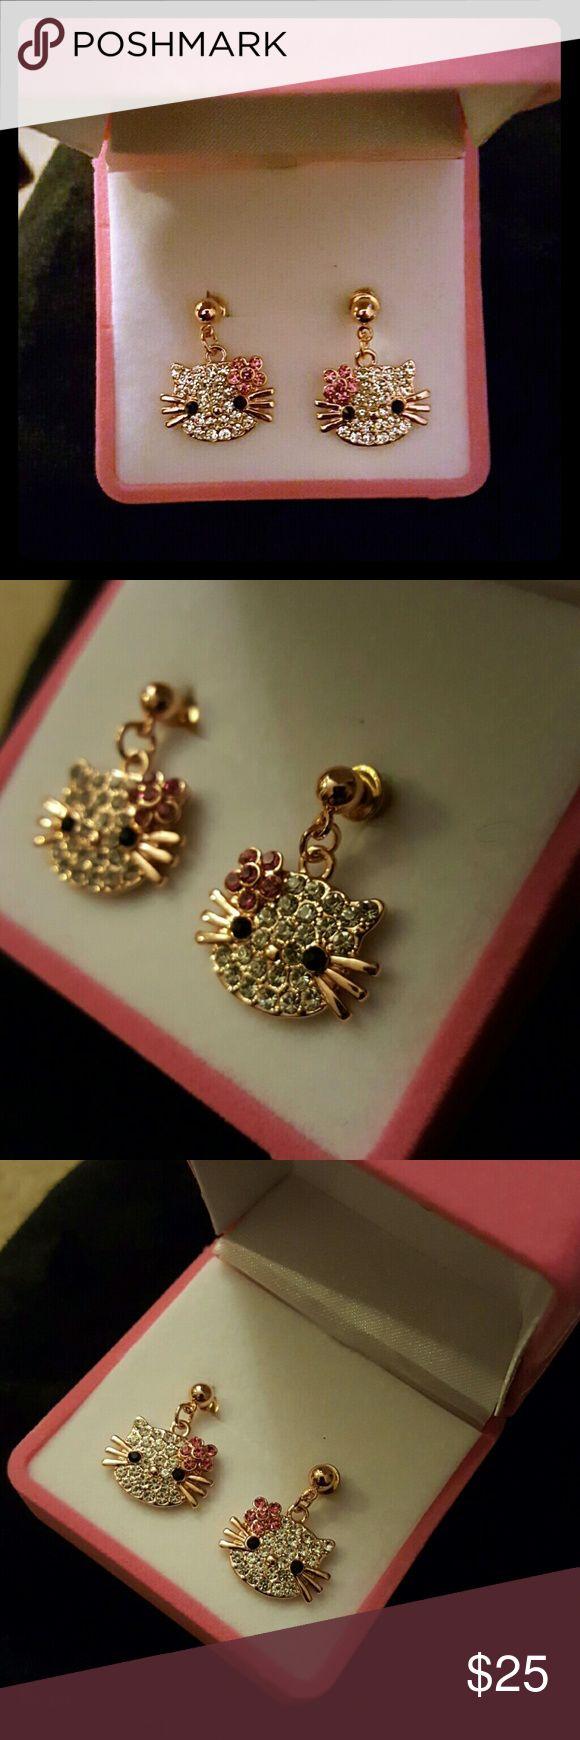 348 best Hello kitty earrings images on Pinterest | Hello kitty ...